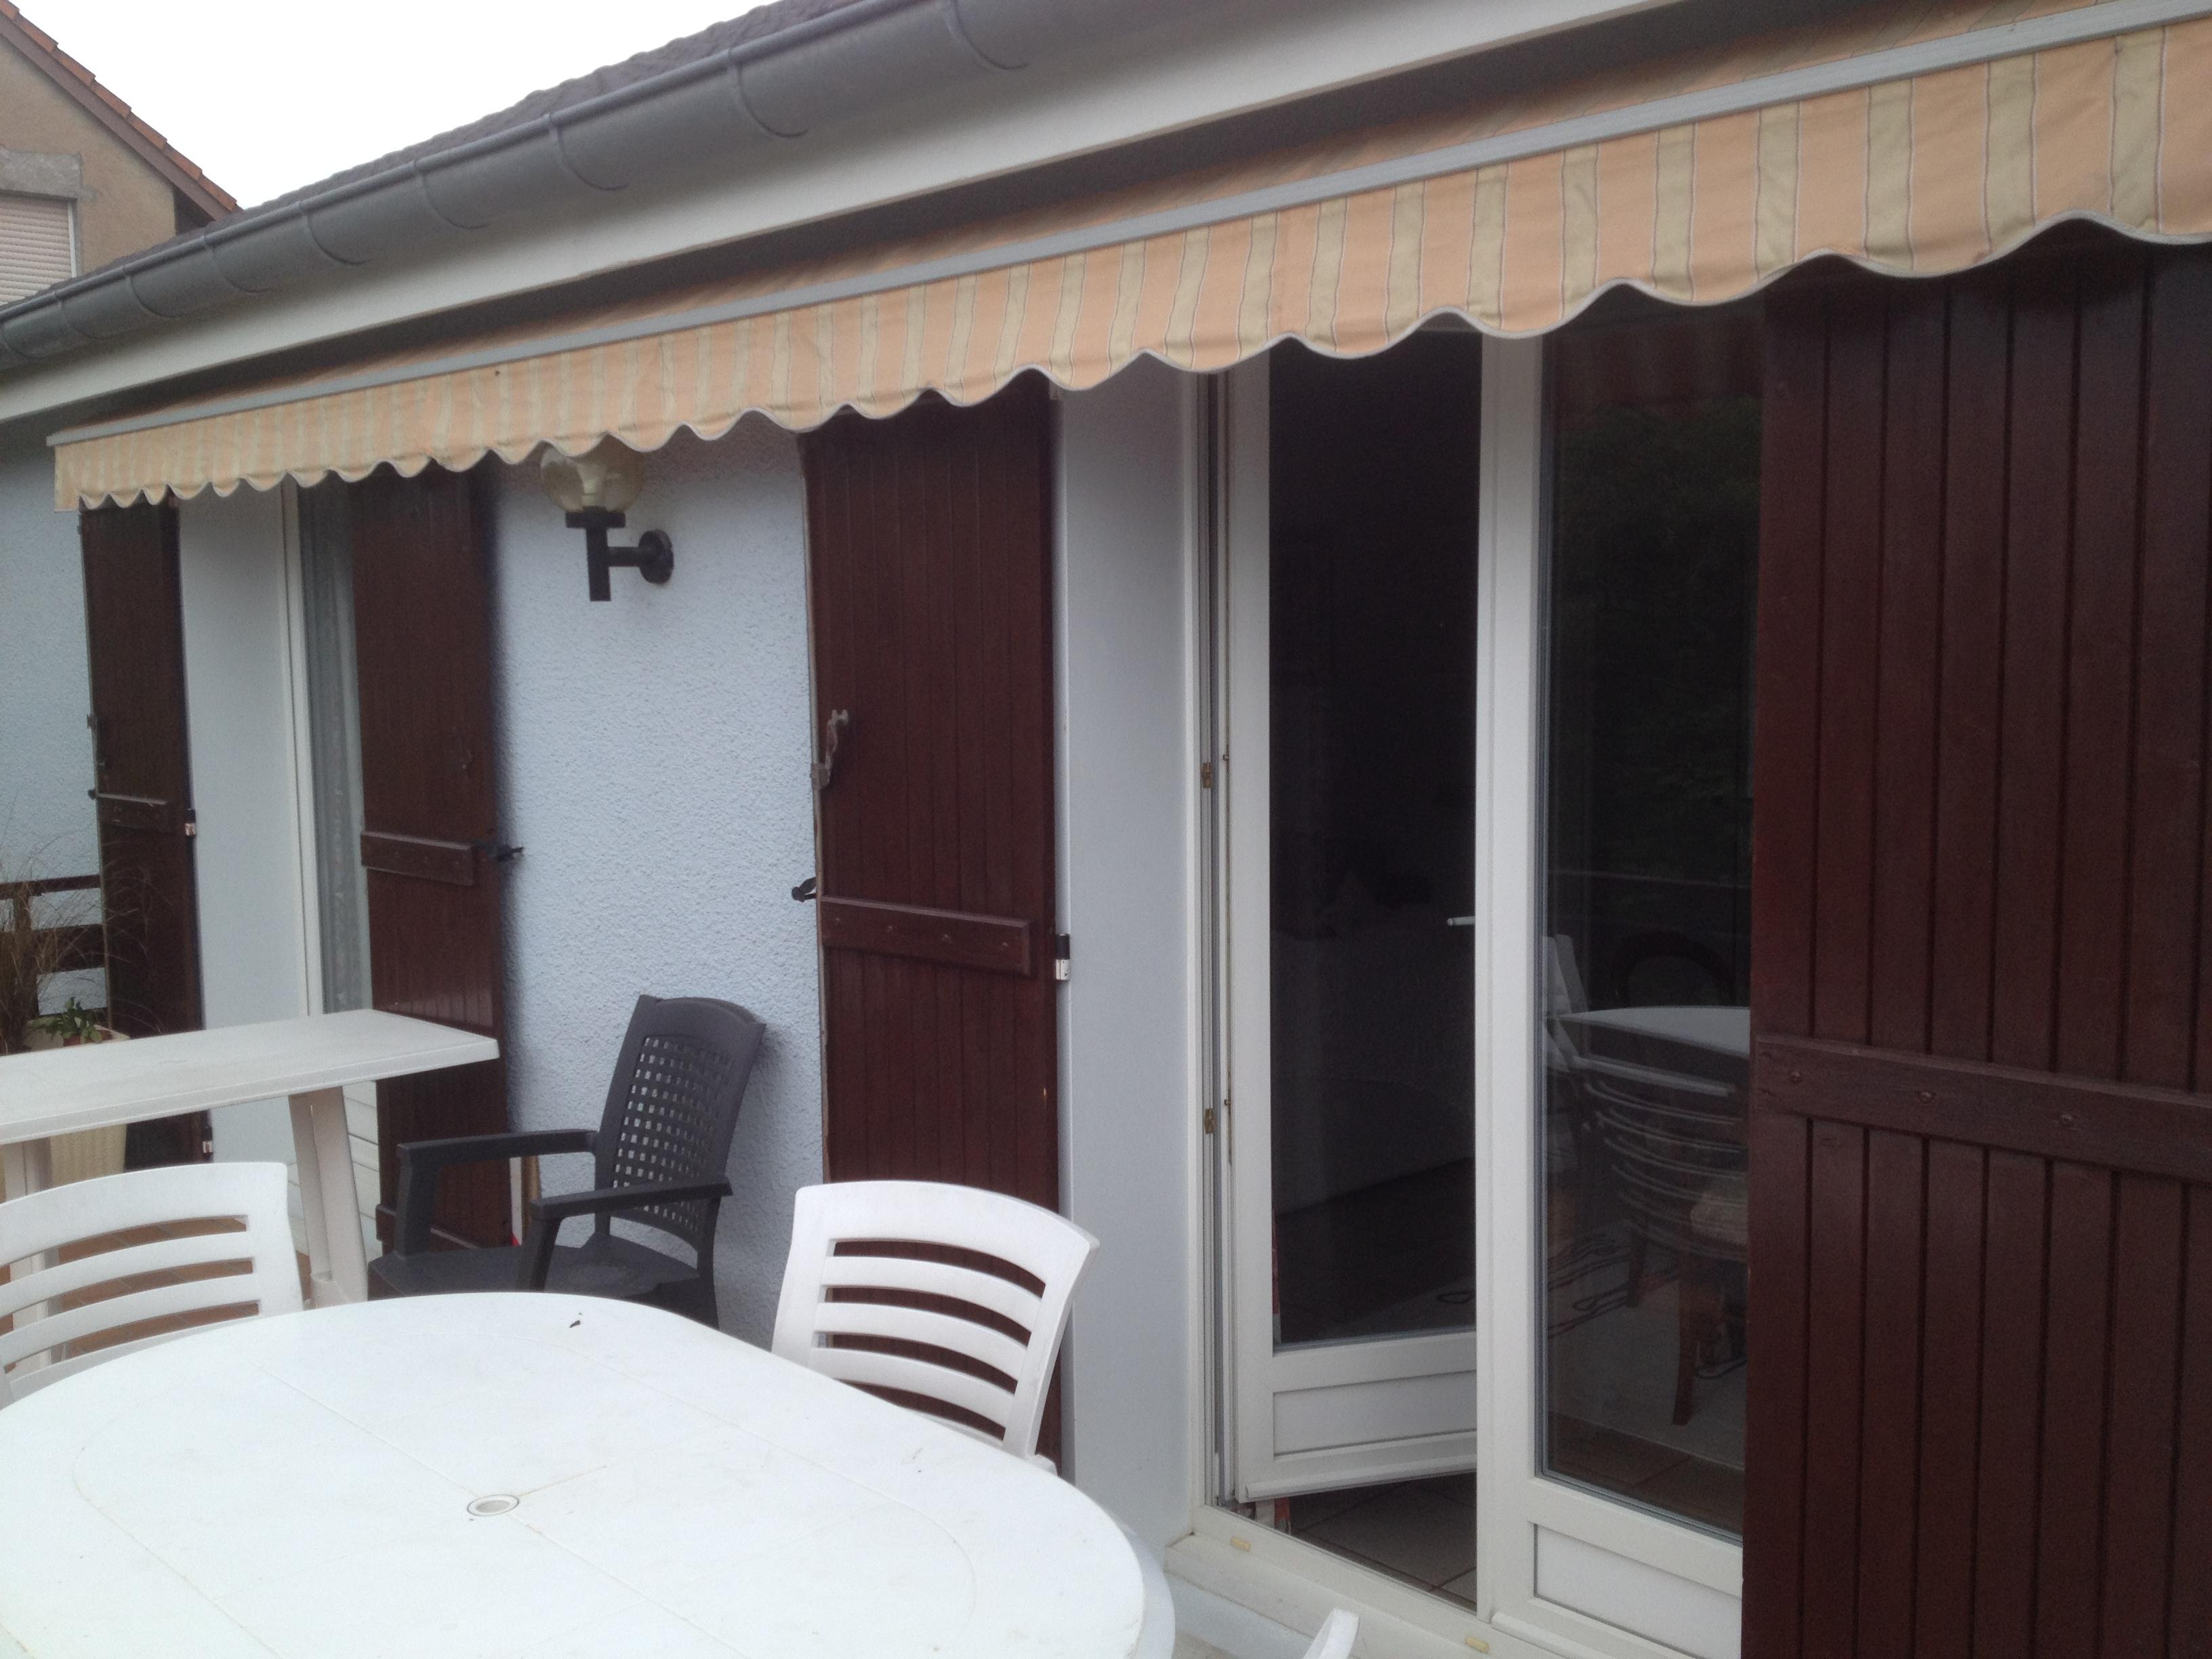 extension d une maison ae habitat obernai strasbourg haguenau saverne. Black Bedroom Furniture Sets. Home Design Ideas